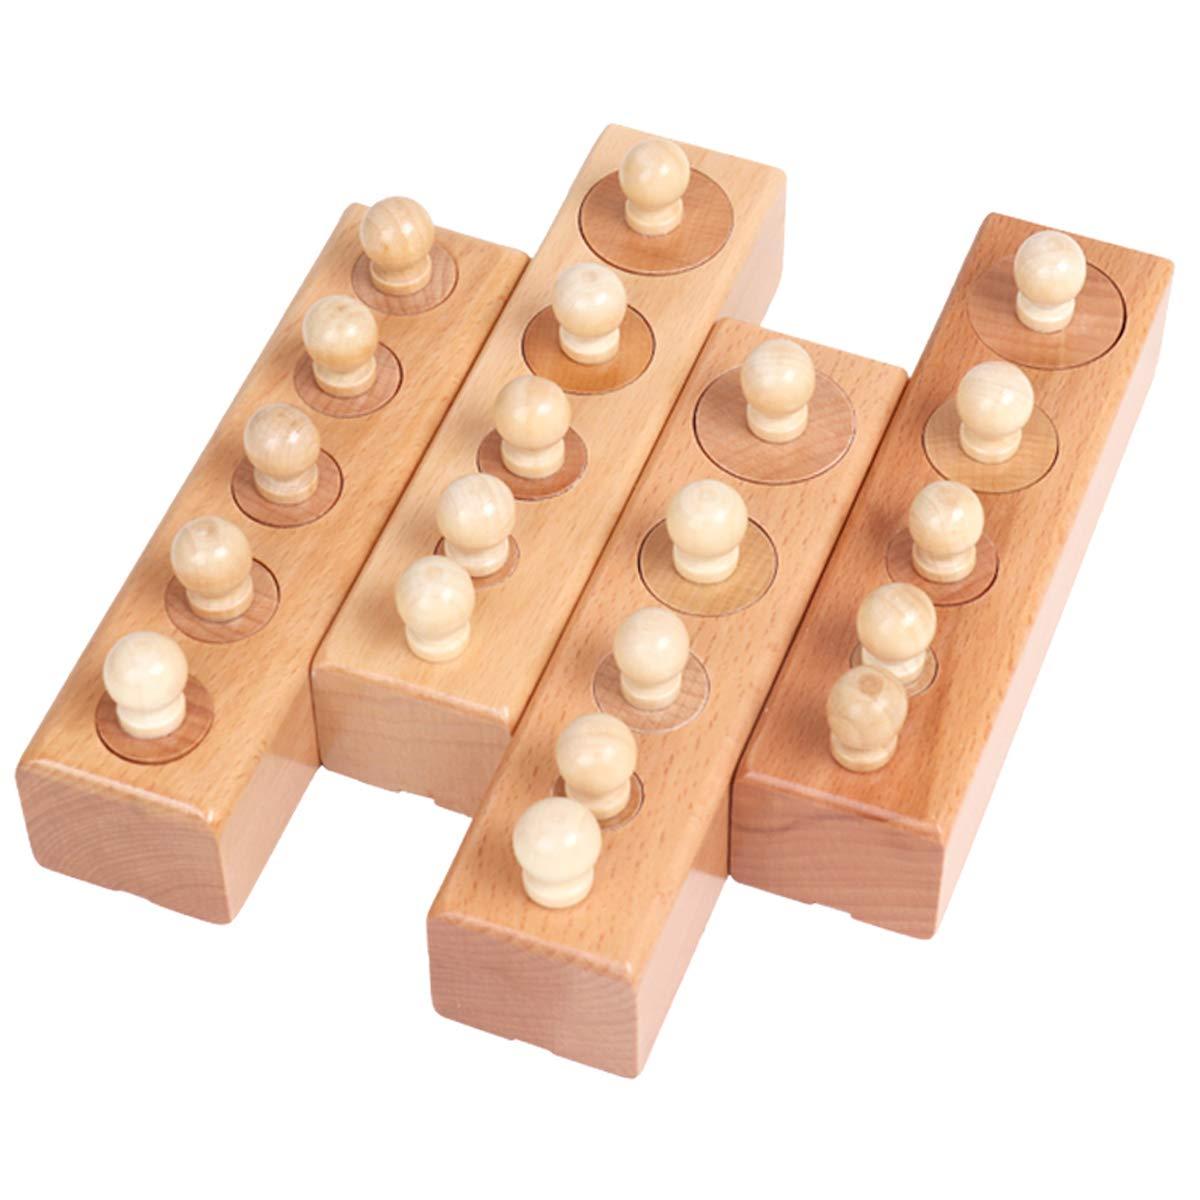 Thoth Montessori Knobbed Cylinder Socket Montessori Materials Wooden Cylinders Ladder Blocks Educational Wooden Toy Montessori Education Toy Family Version